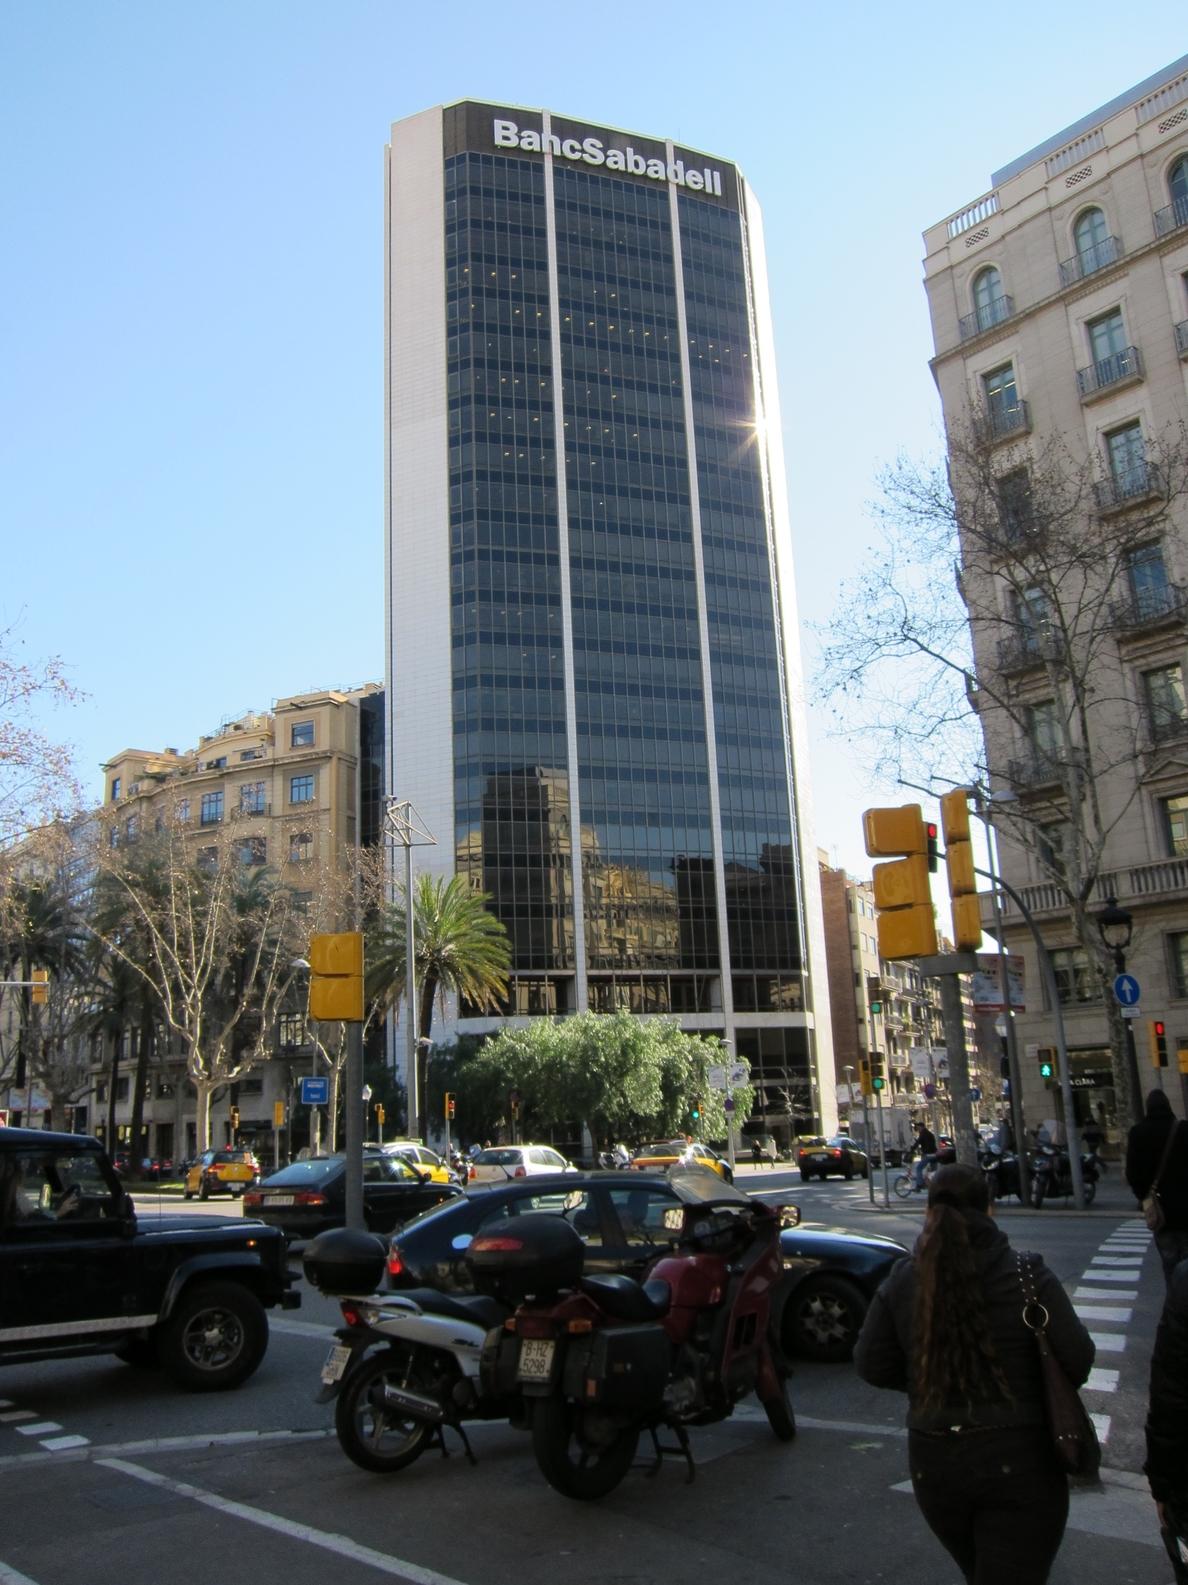 El consejo del Sabadell ganó 7,48 millones de euros en 2013